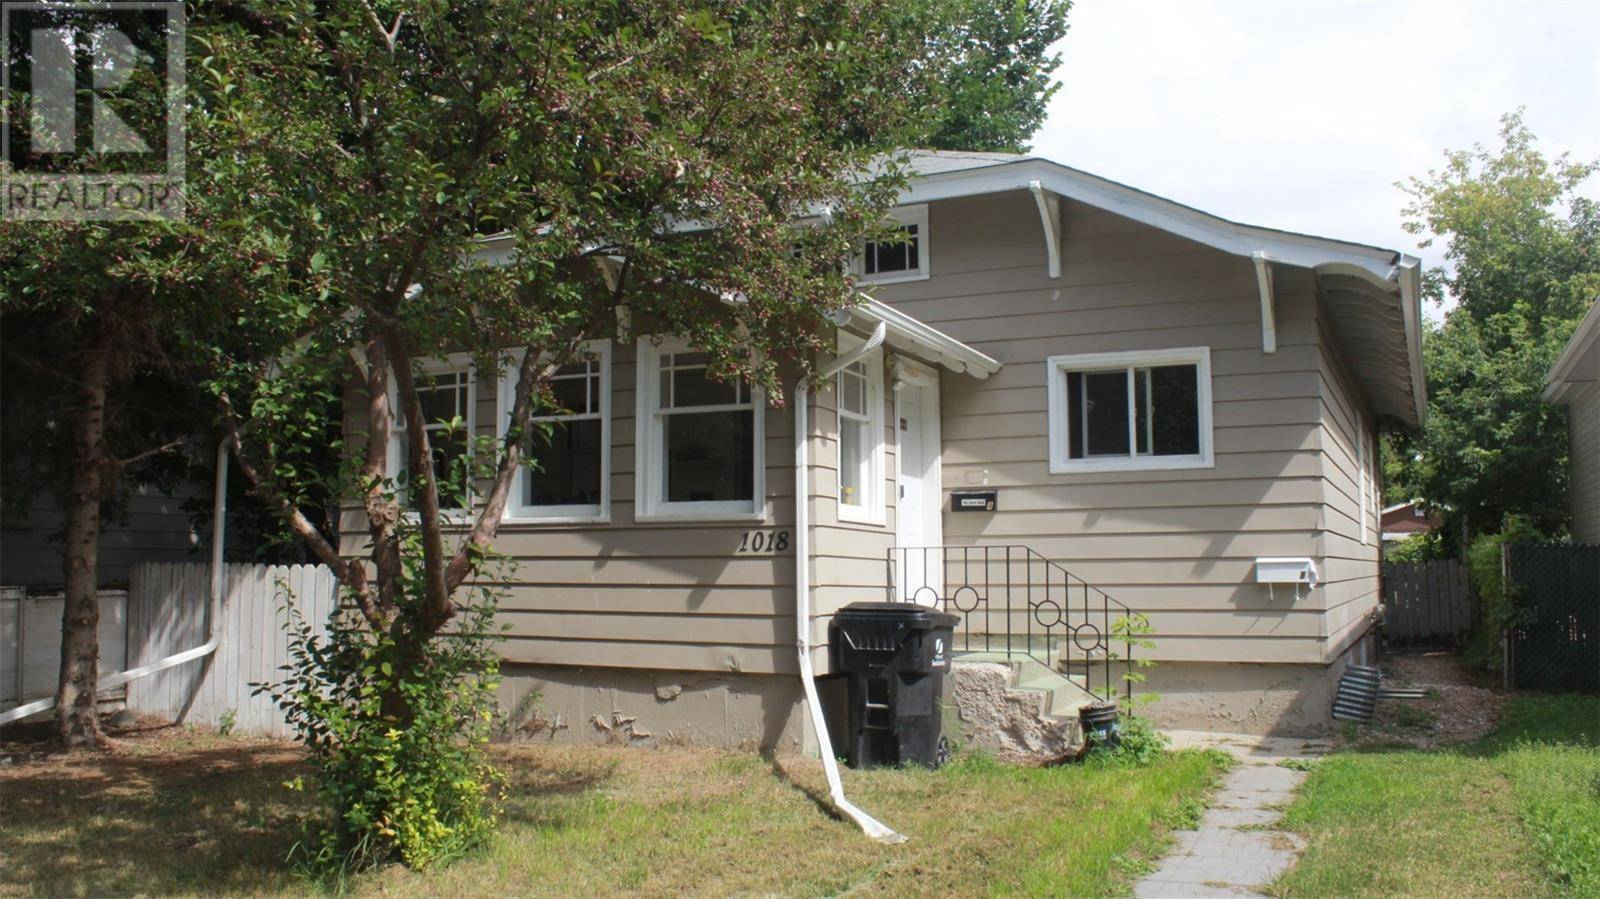 House for sale at 1018 K Ave N Saskatoon Saskatchewan - MLS: SK783542